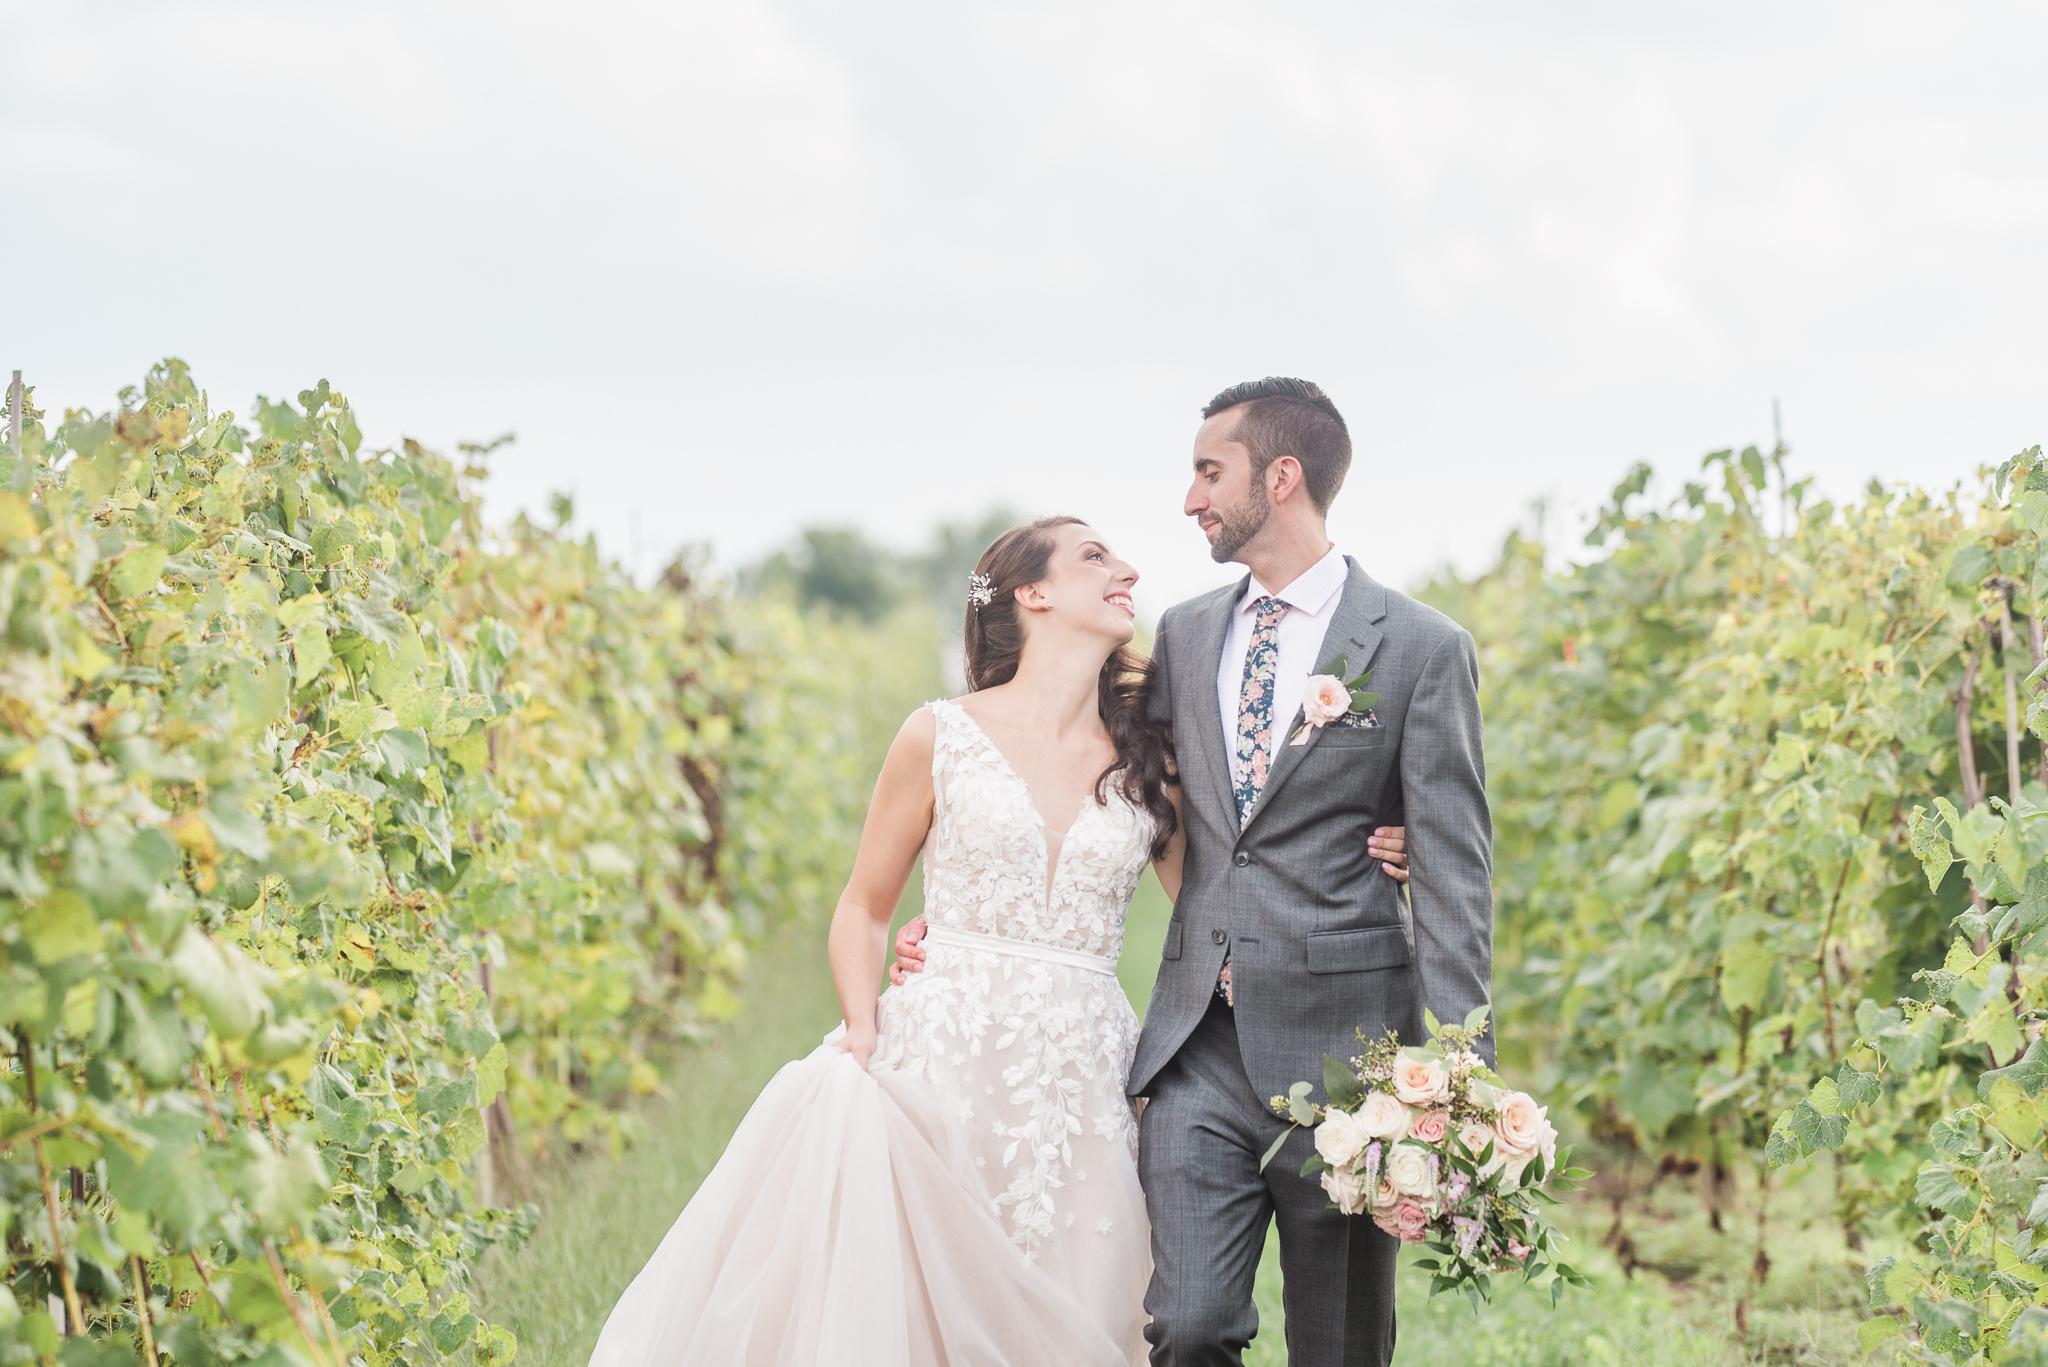 Sycamore at Mallow Run Wedding7134.jpg